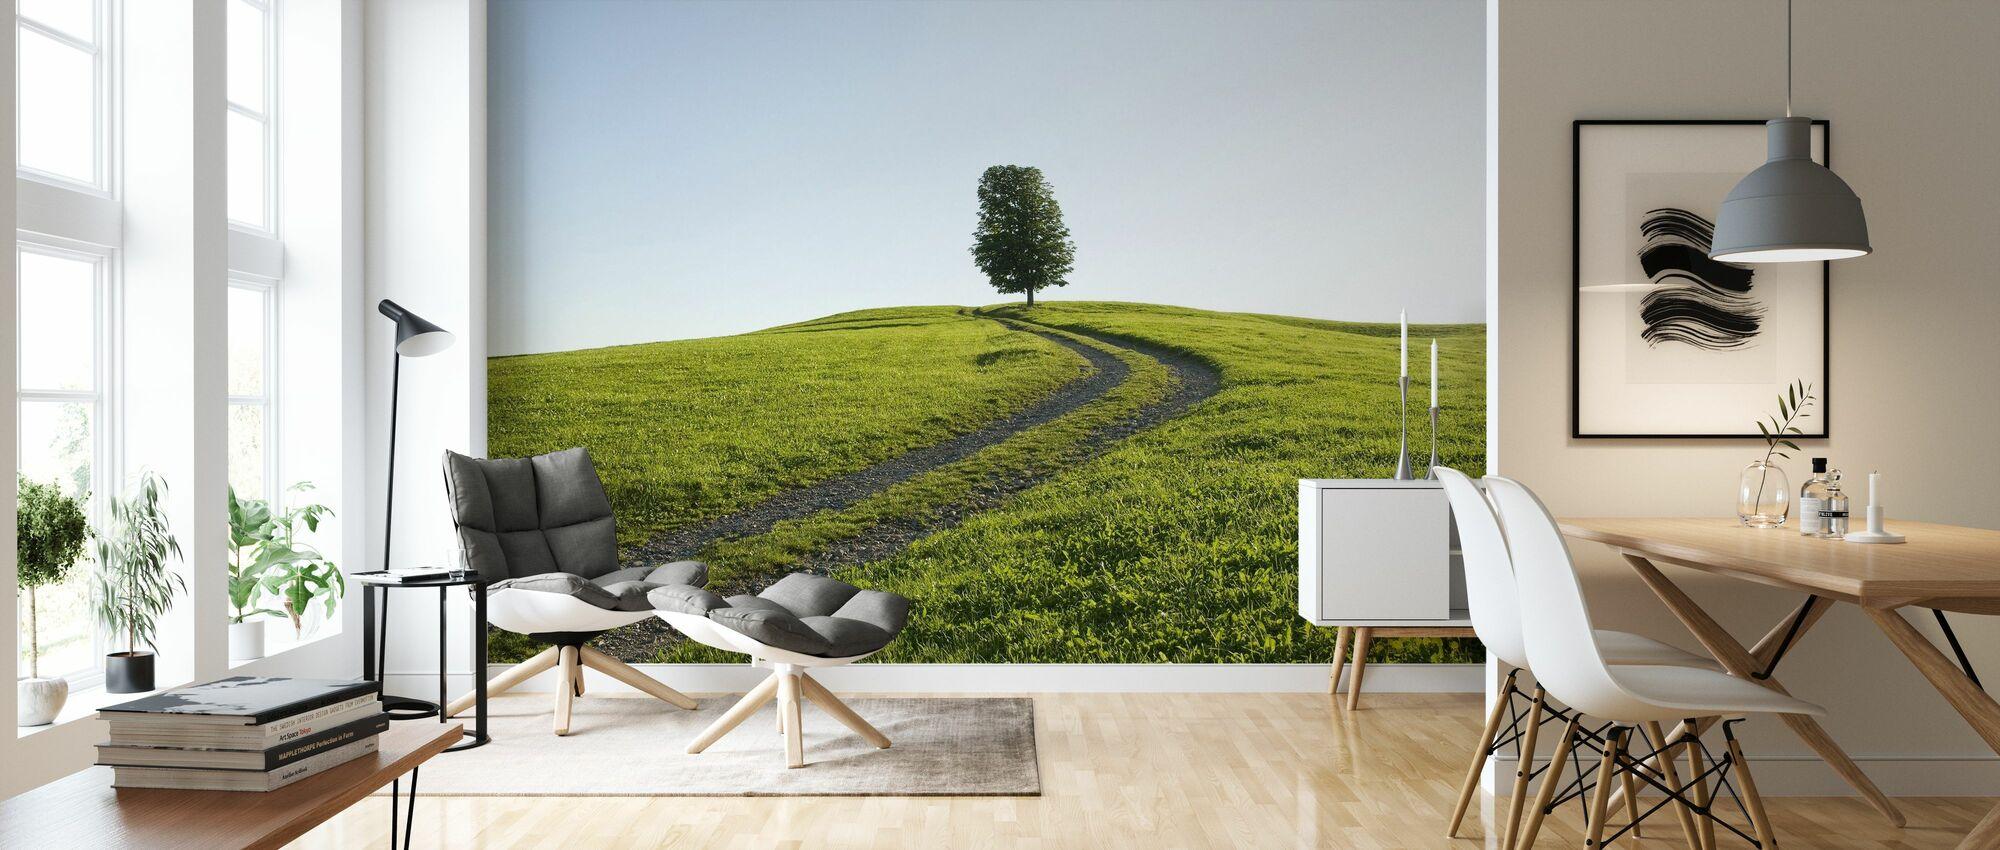 Old Farm Track - Wallpaper - Living Room